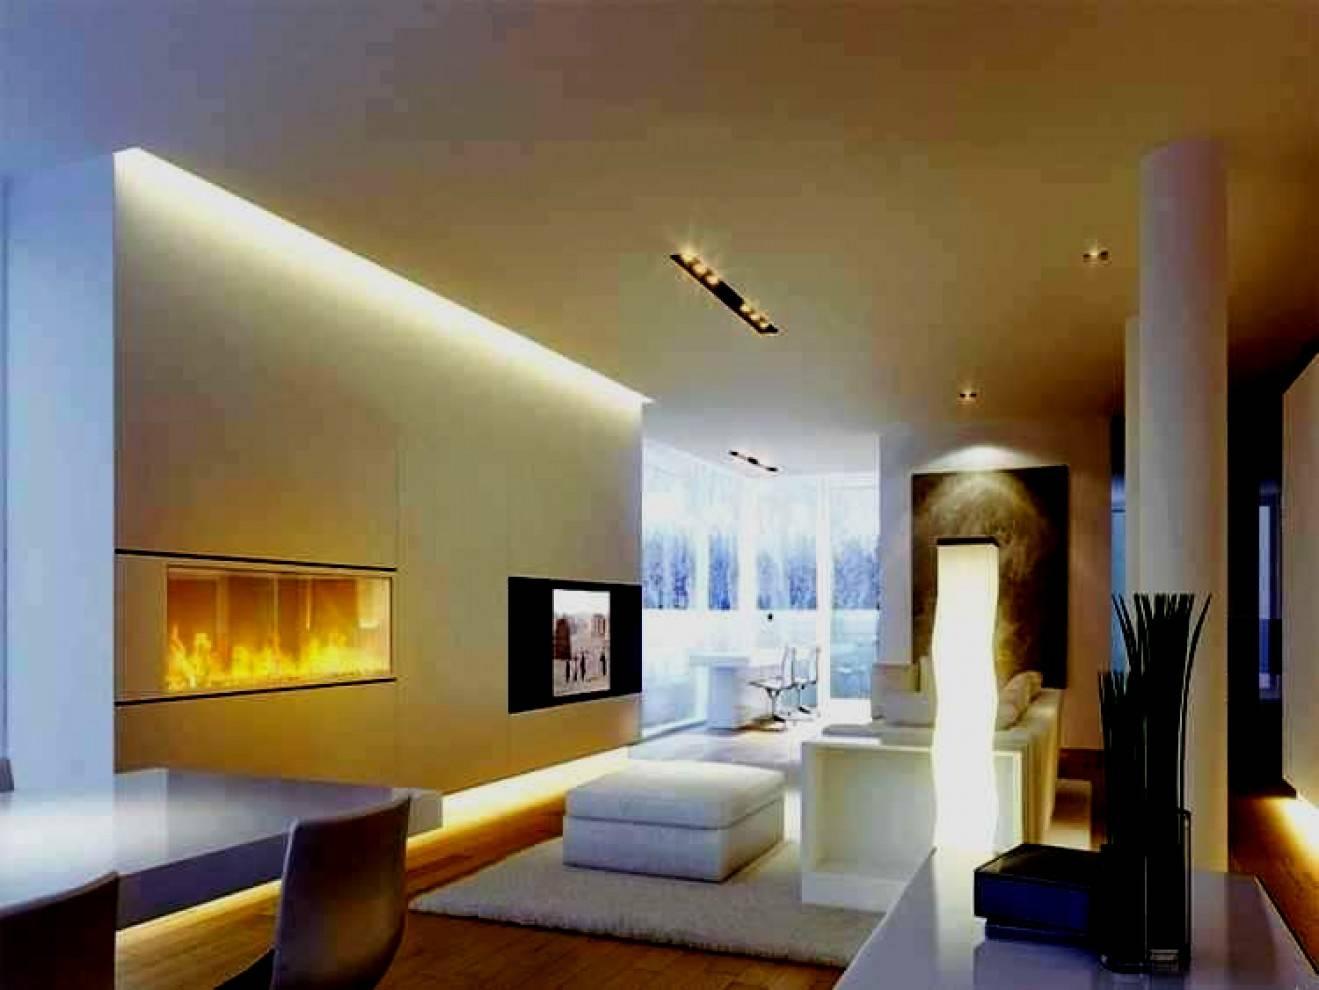 deko fur wohnzimmer ideen best of beleuchtung wohnzimmer ideen licht brillant led wohnzimmer of deko fur wohnzimmer ideen